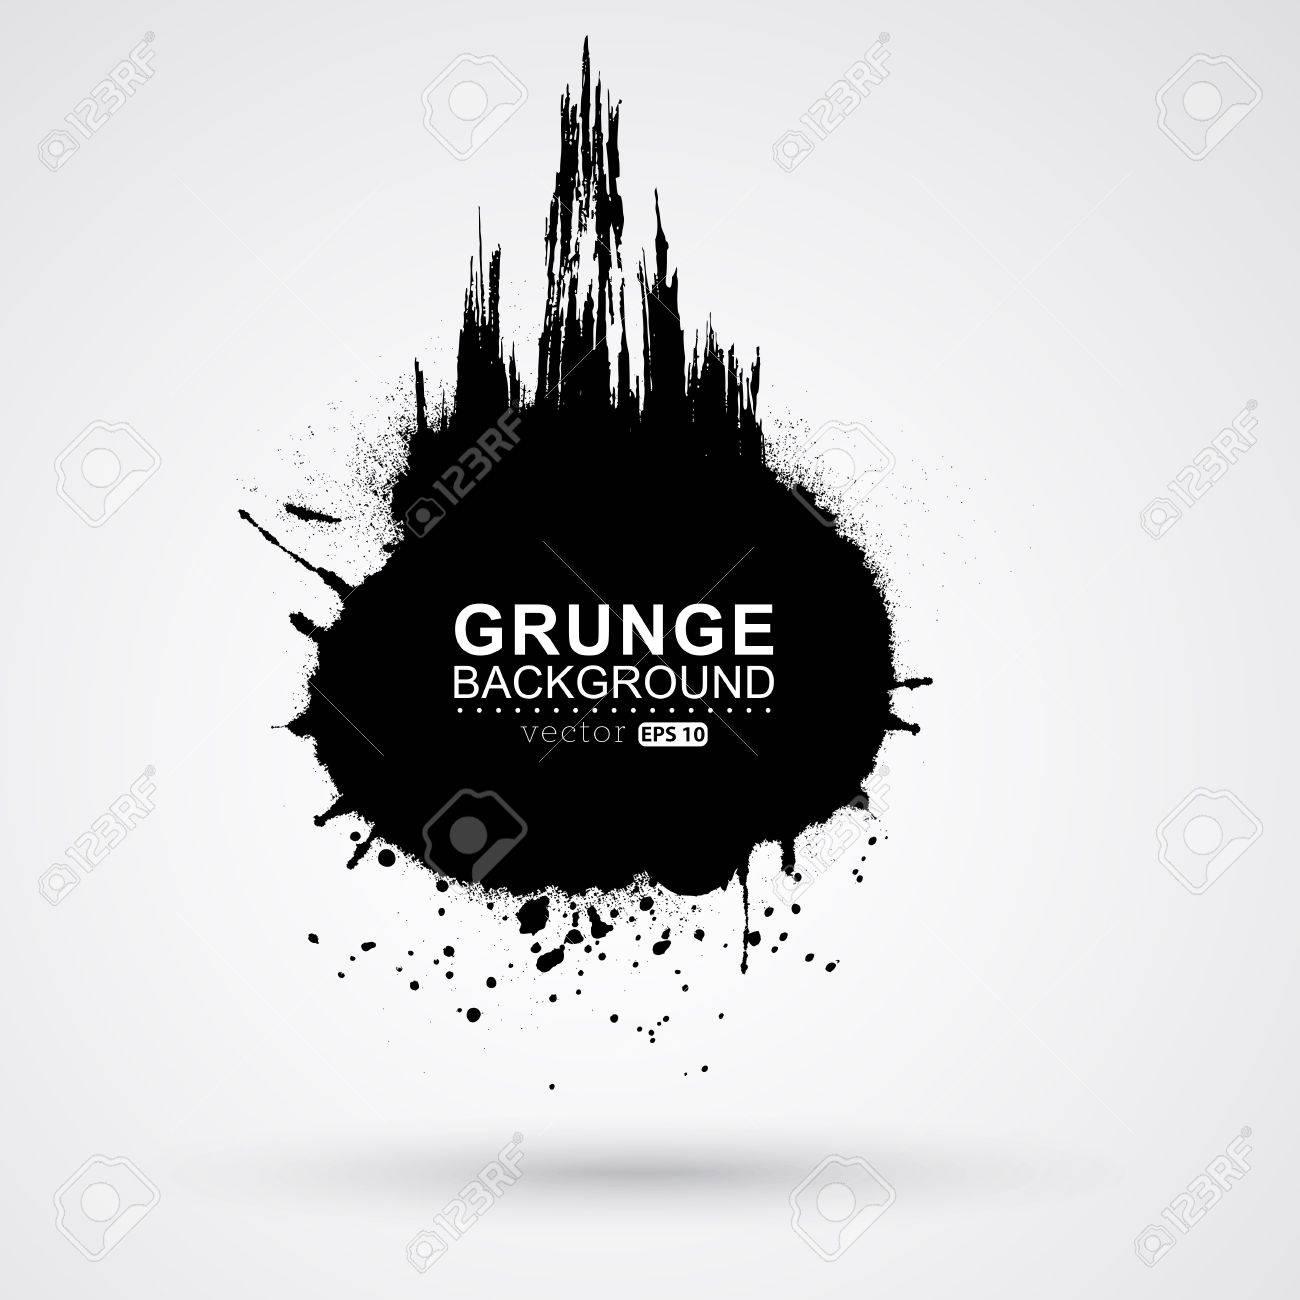 Figured brush strokes brush and ink. Stock Vector - 22895772